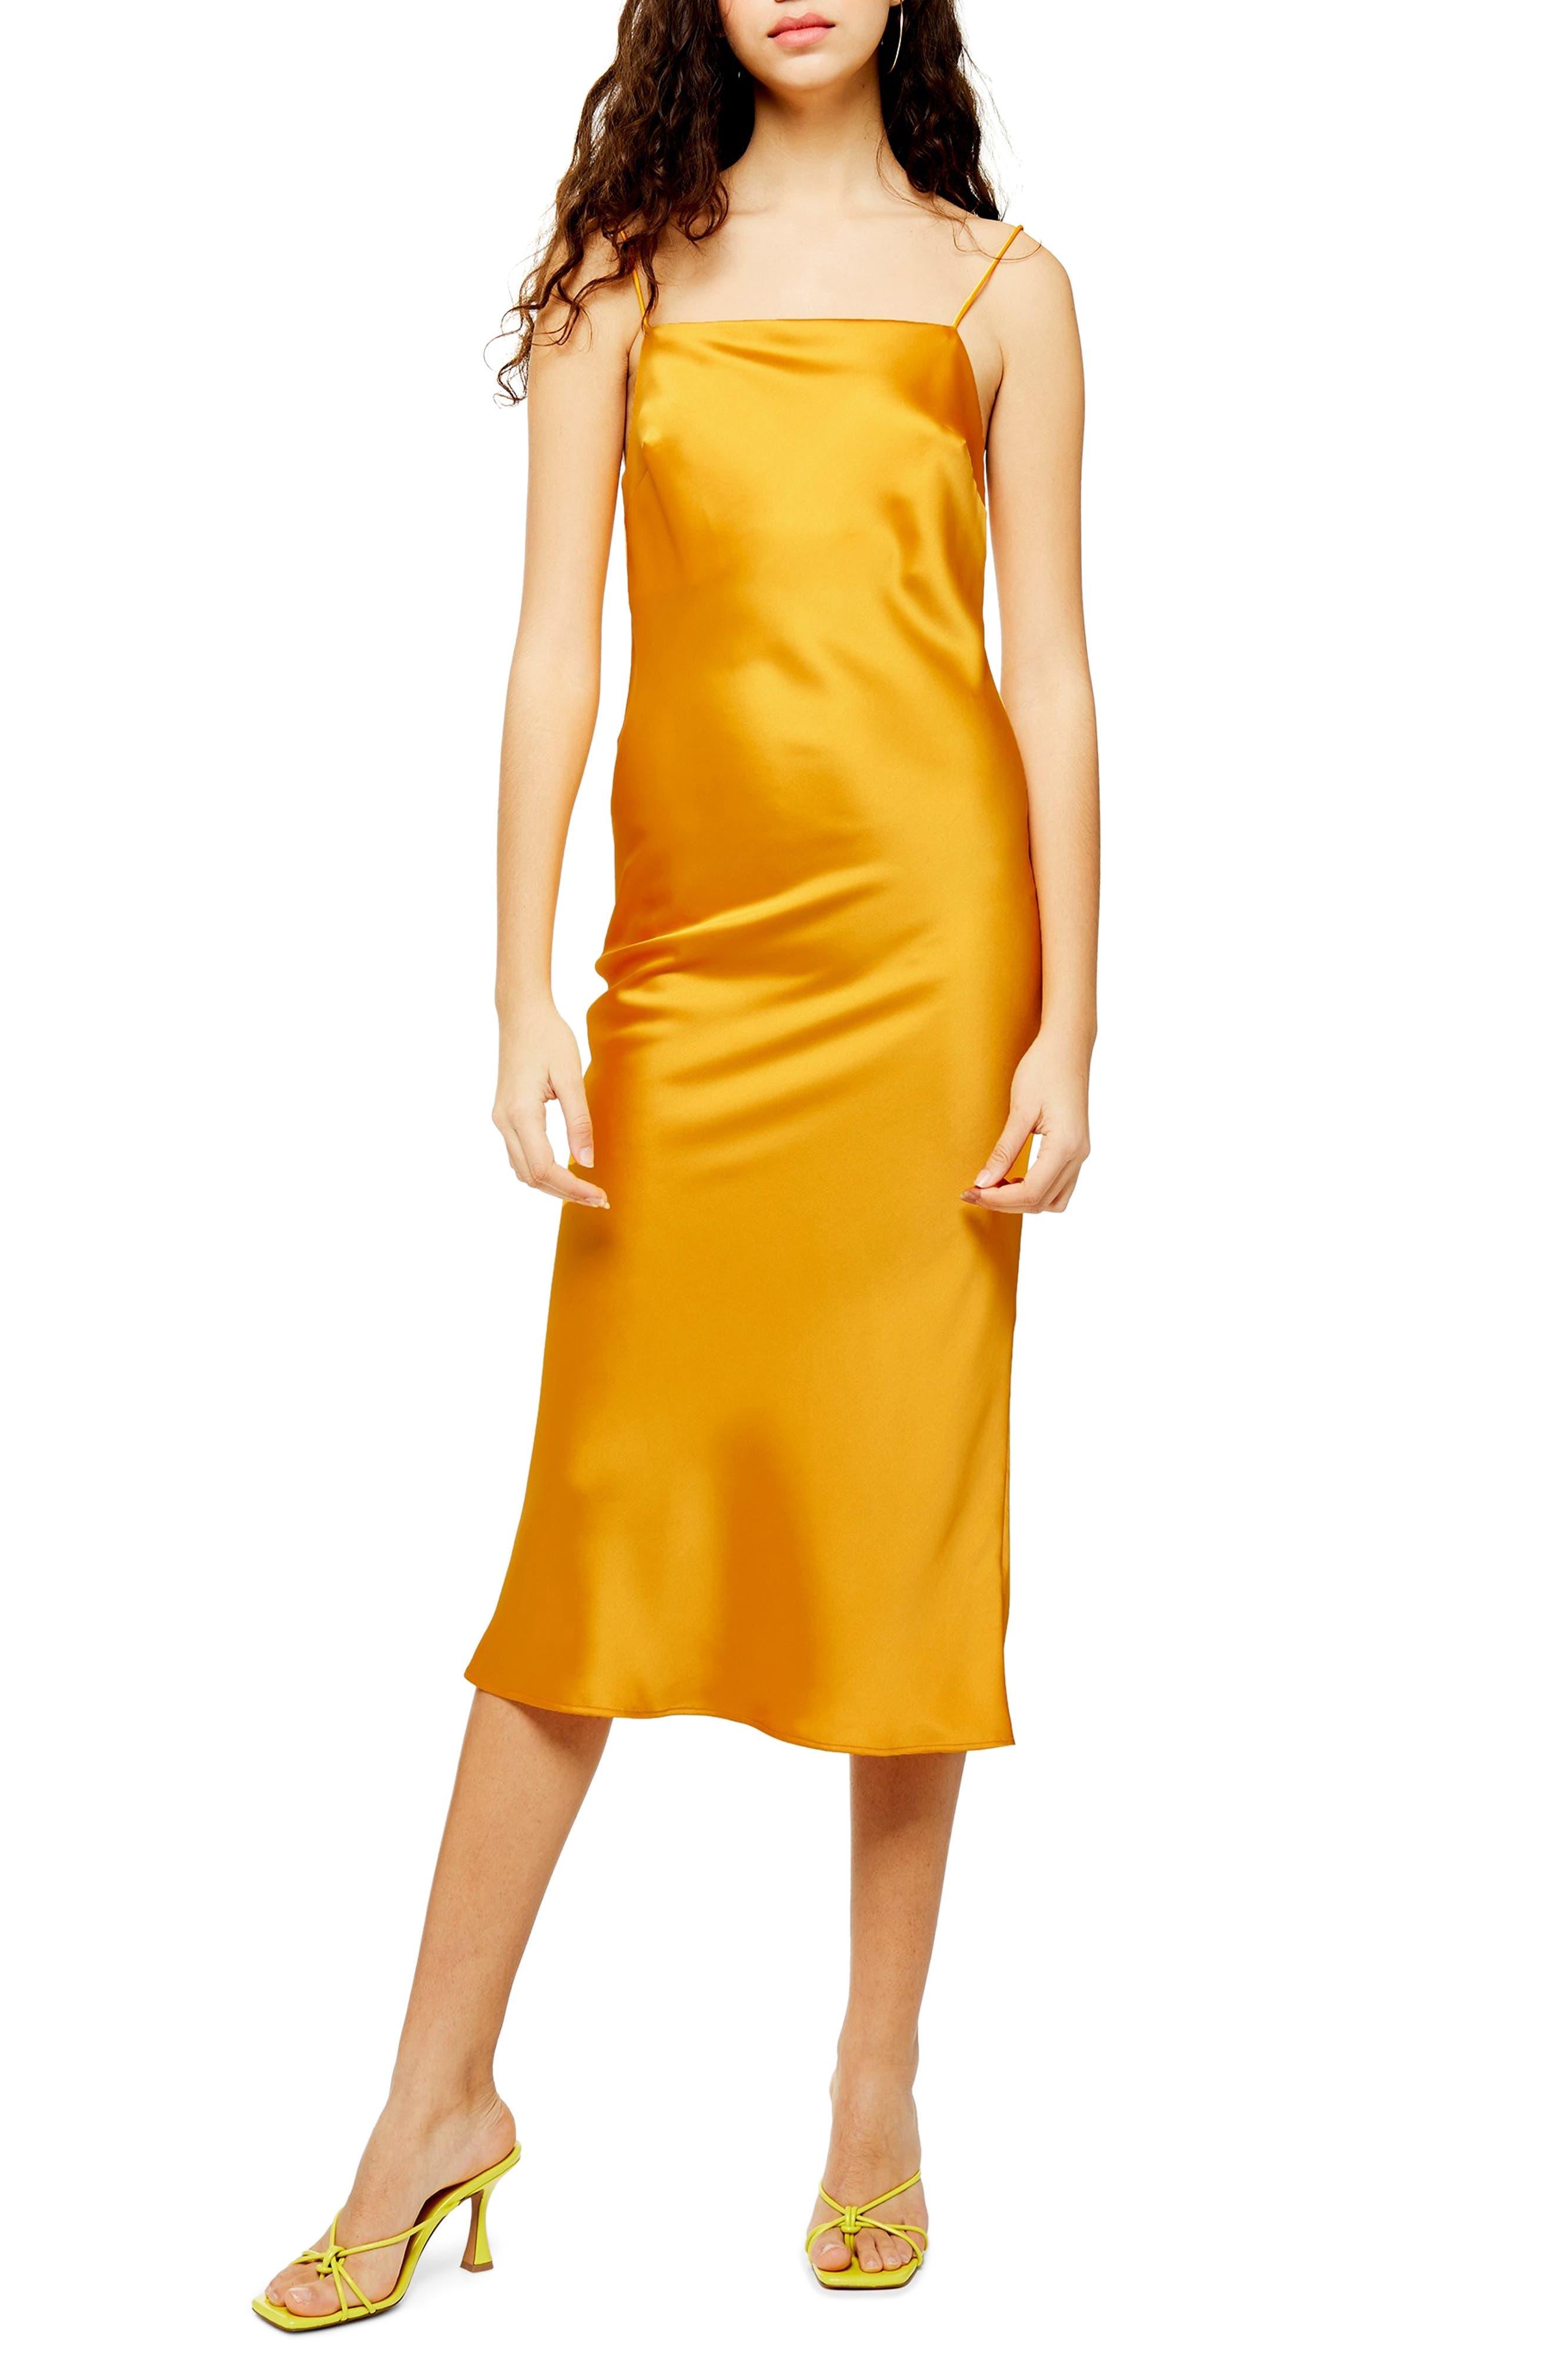 Topshop Square Neck Slipdress, US (fits like 2-4) - Yellow